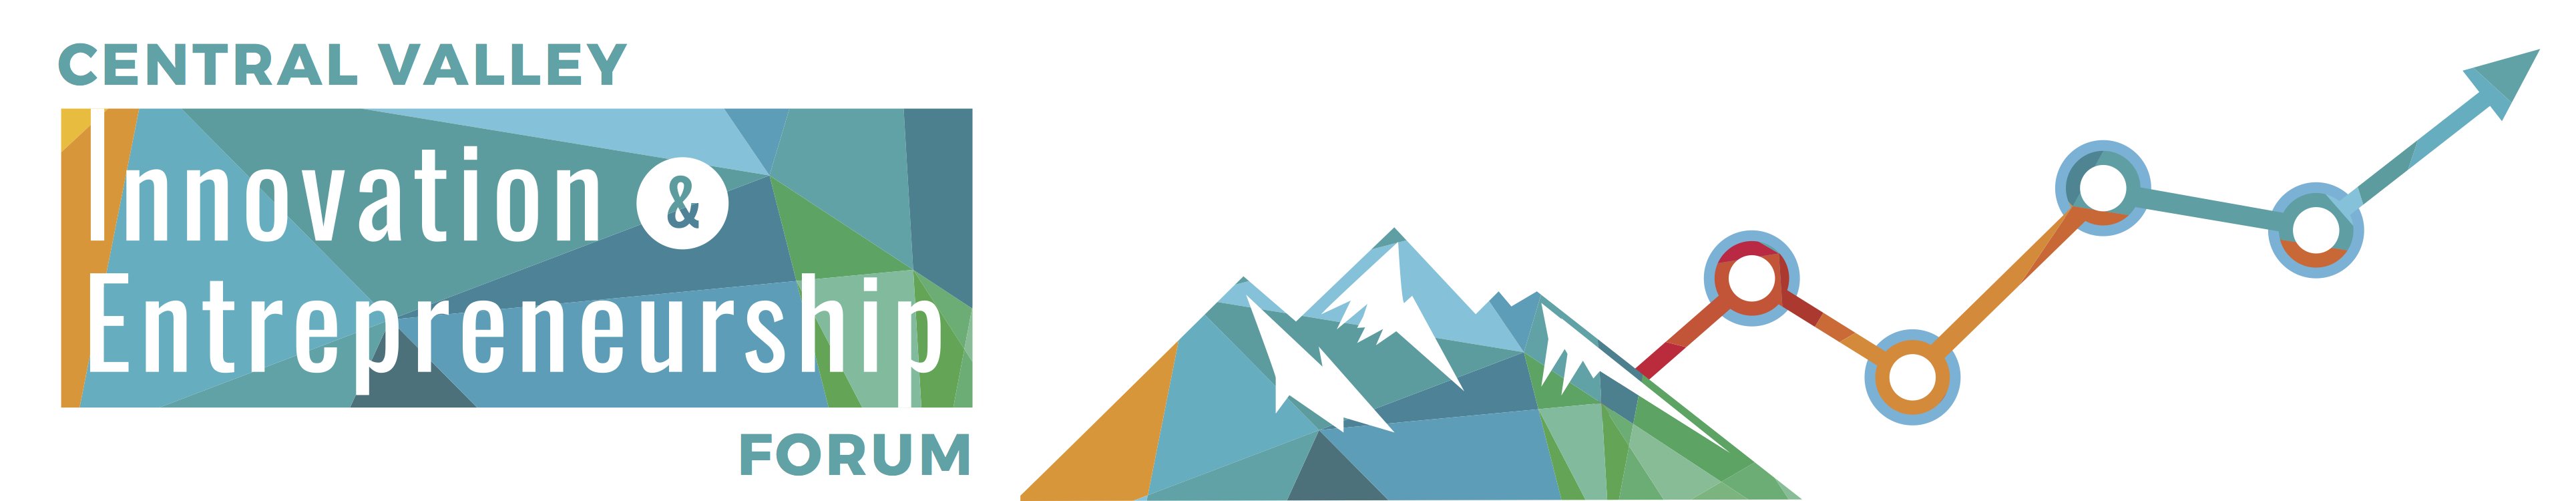 Central Valley Innovation & Entrepreneurship Forum